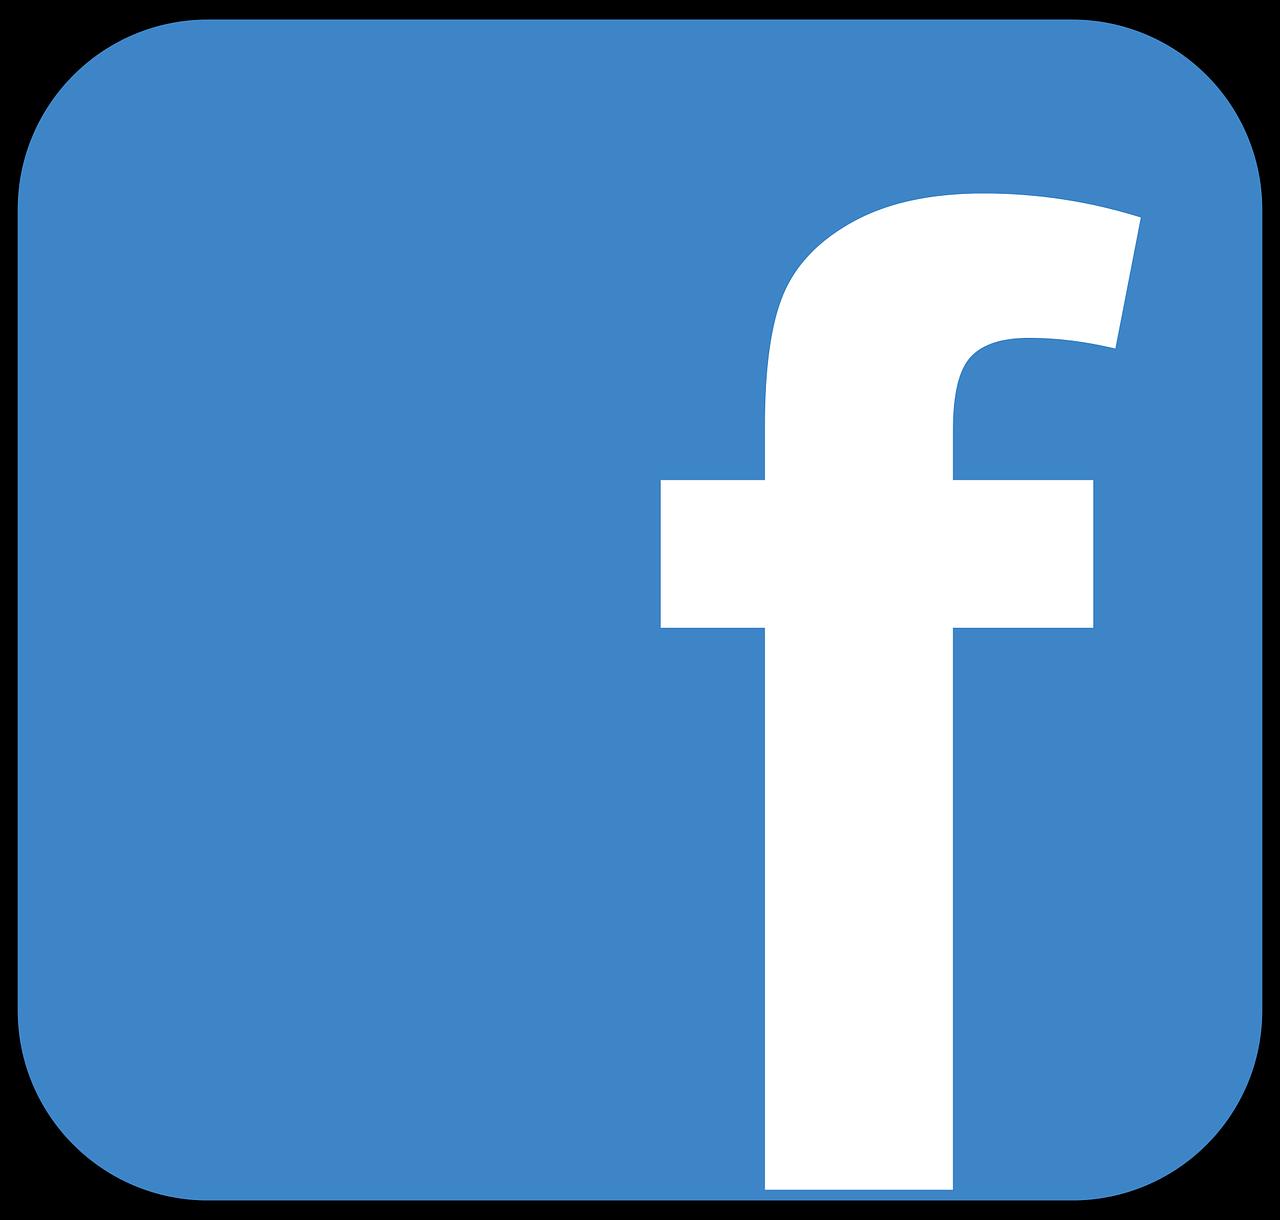 facebook-1924510_1280